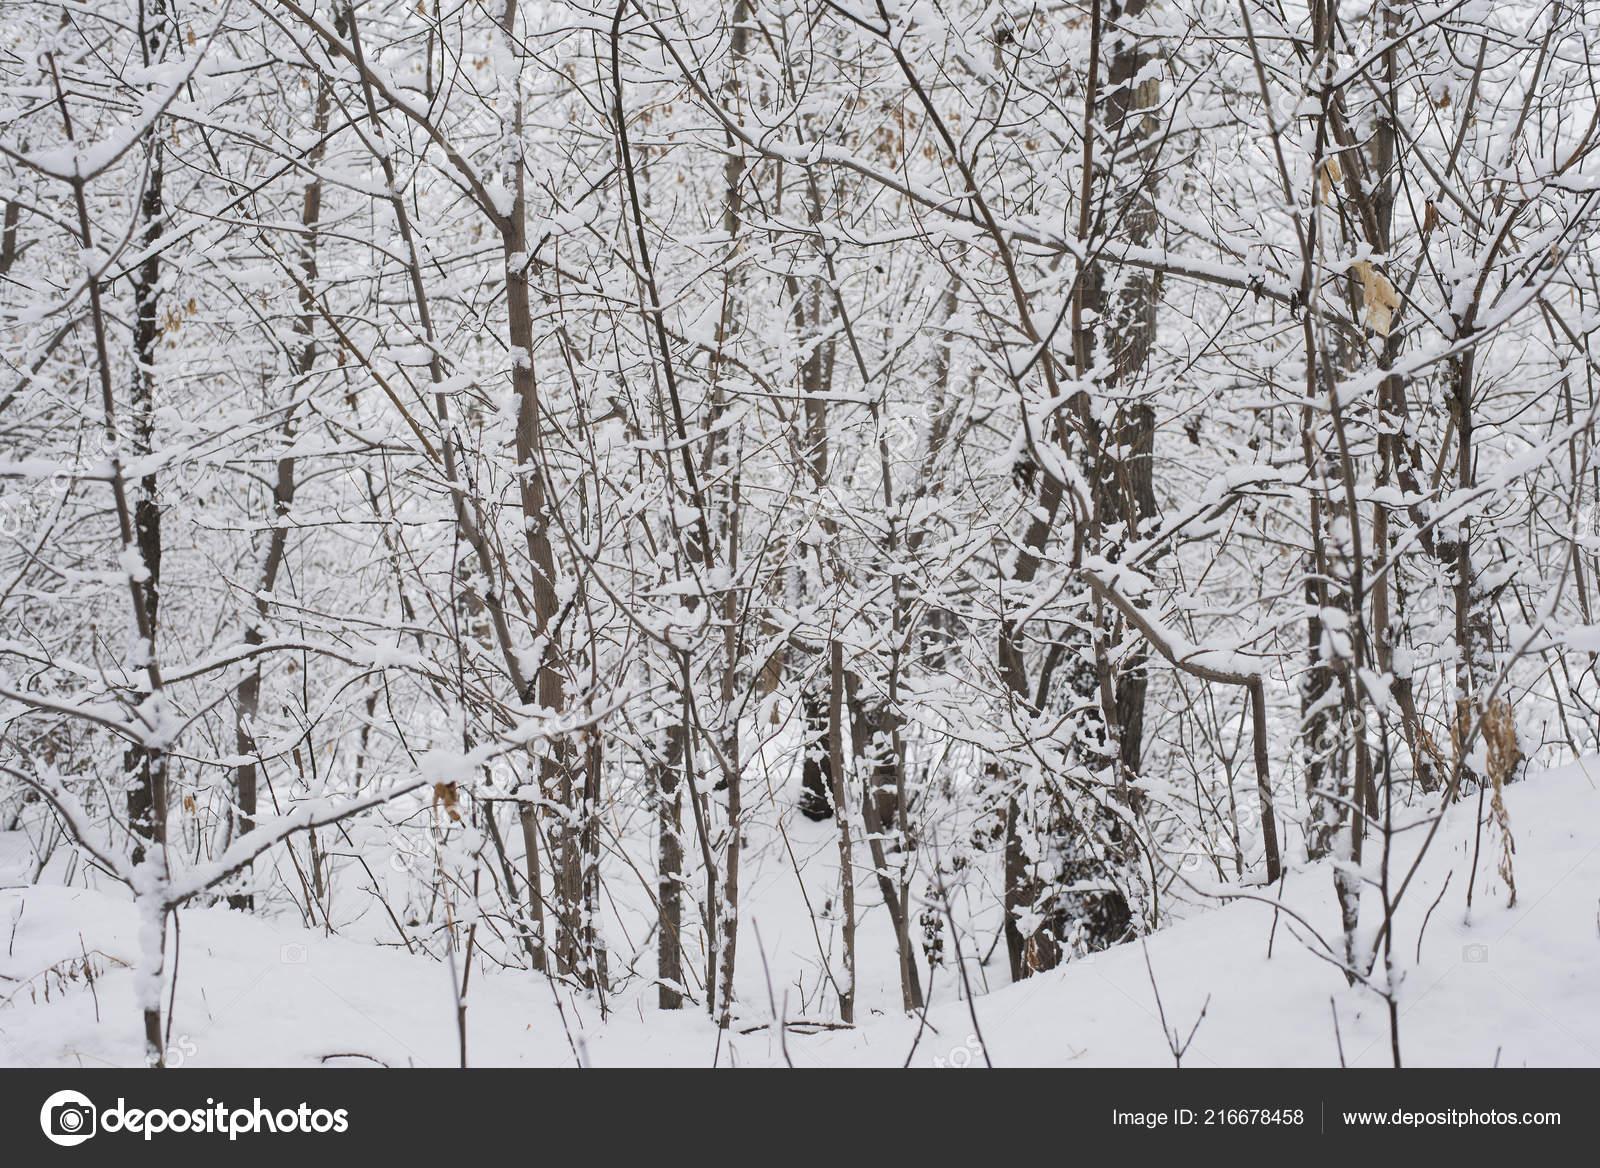 depositphotos 216678458 stock photo winter landscape park garden snow